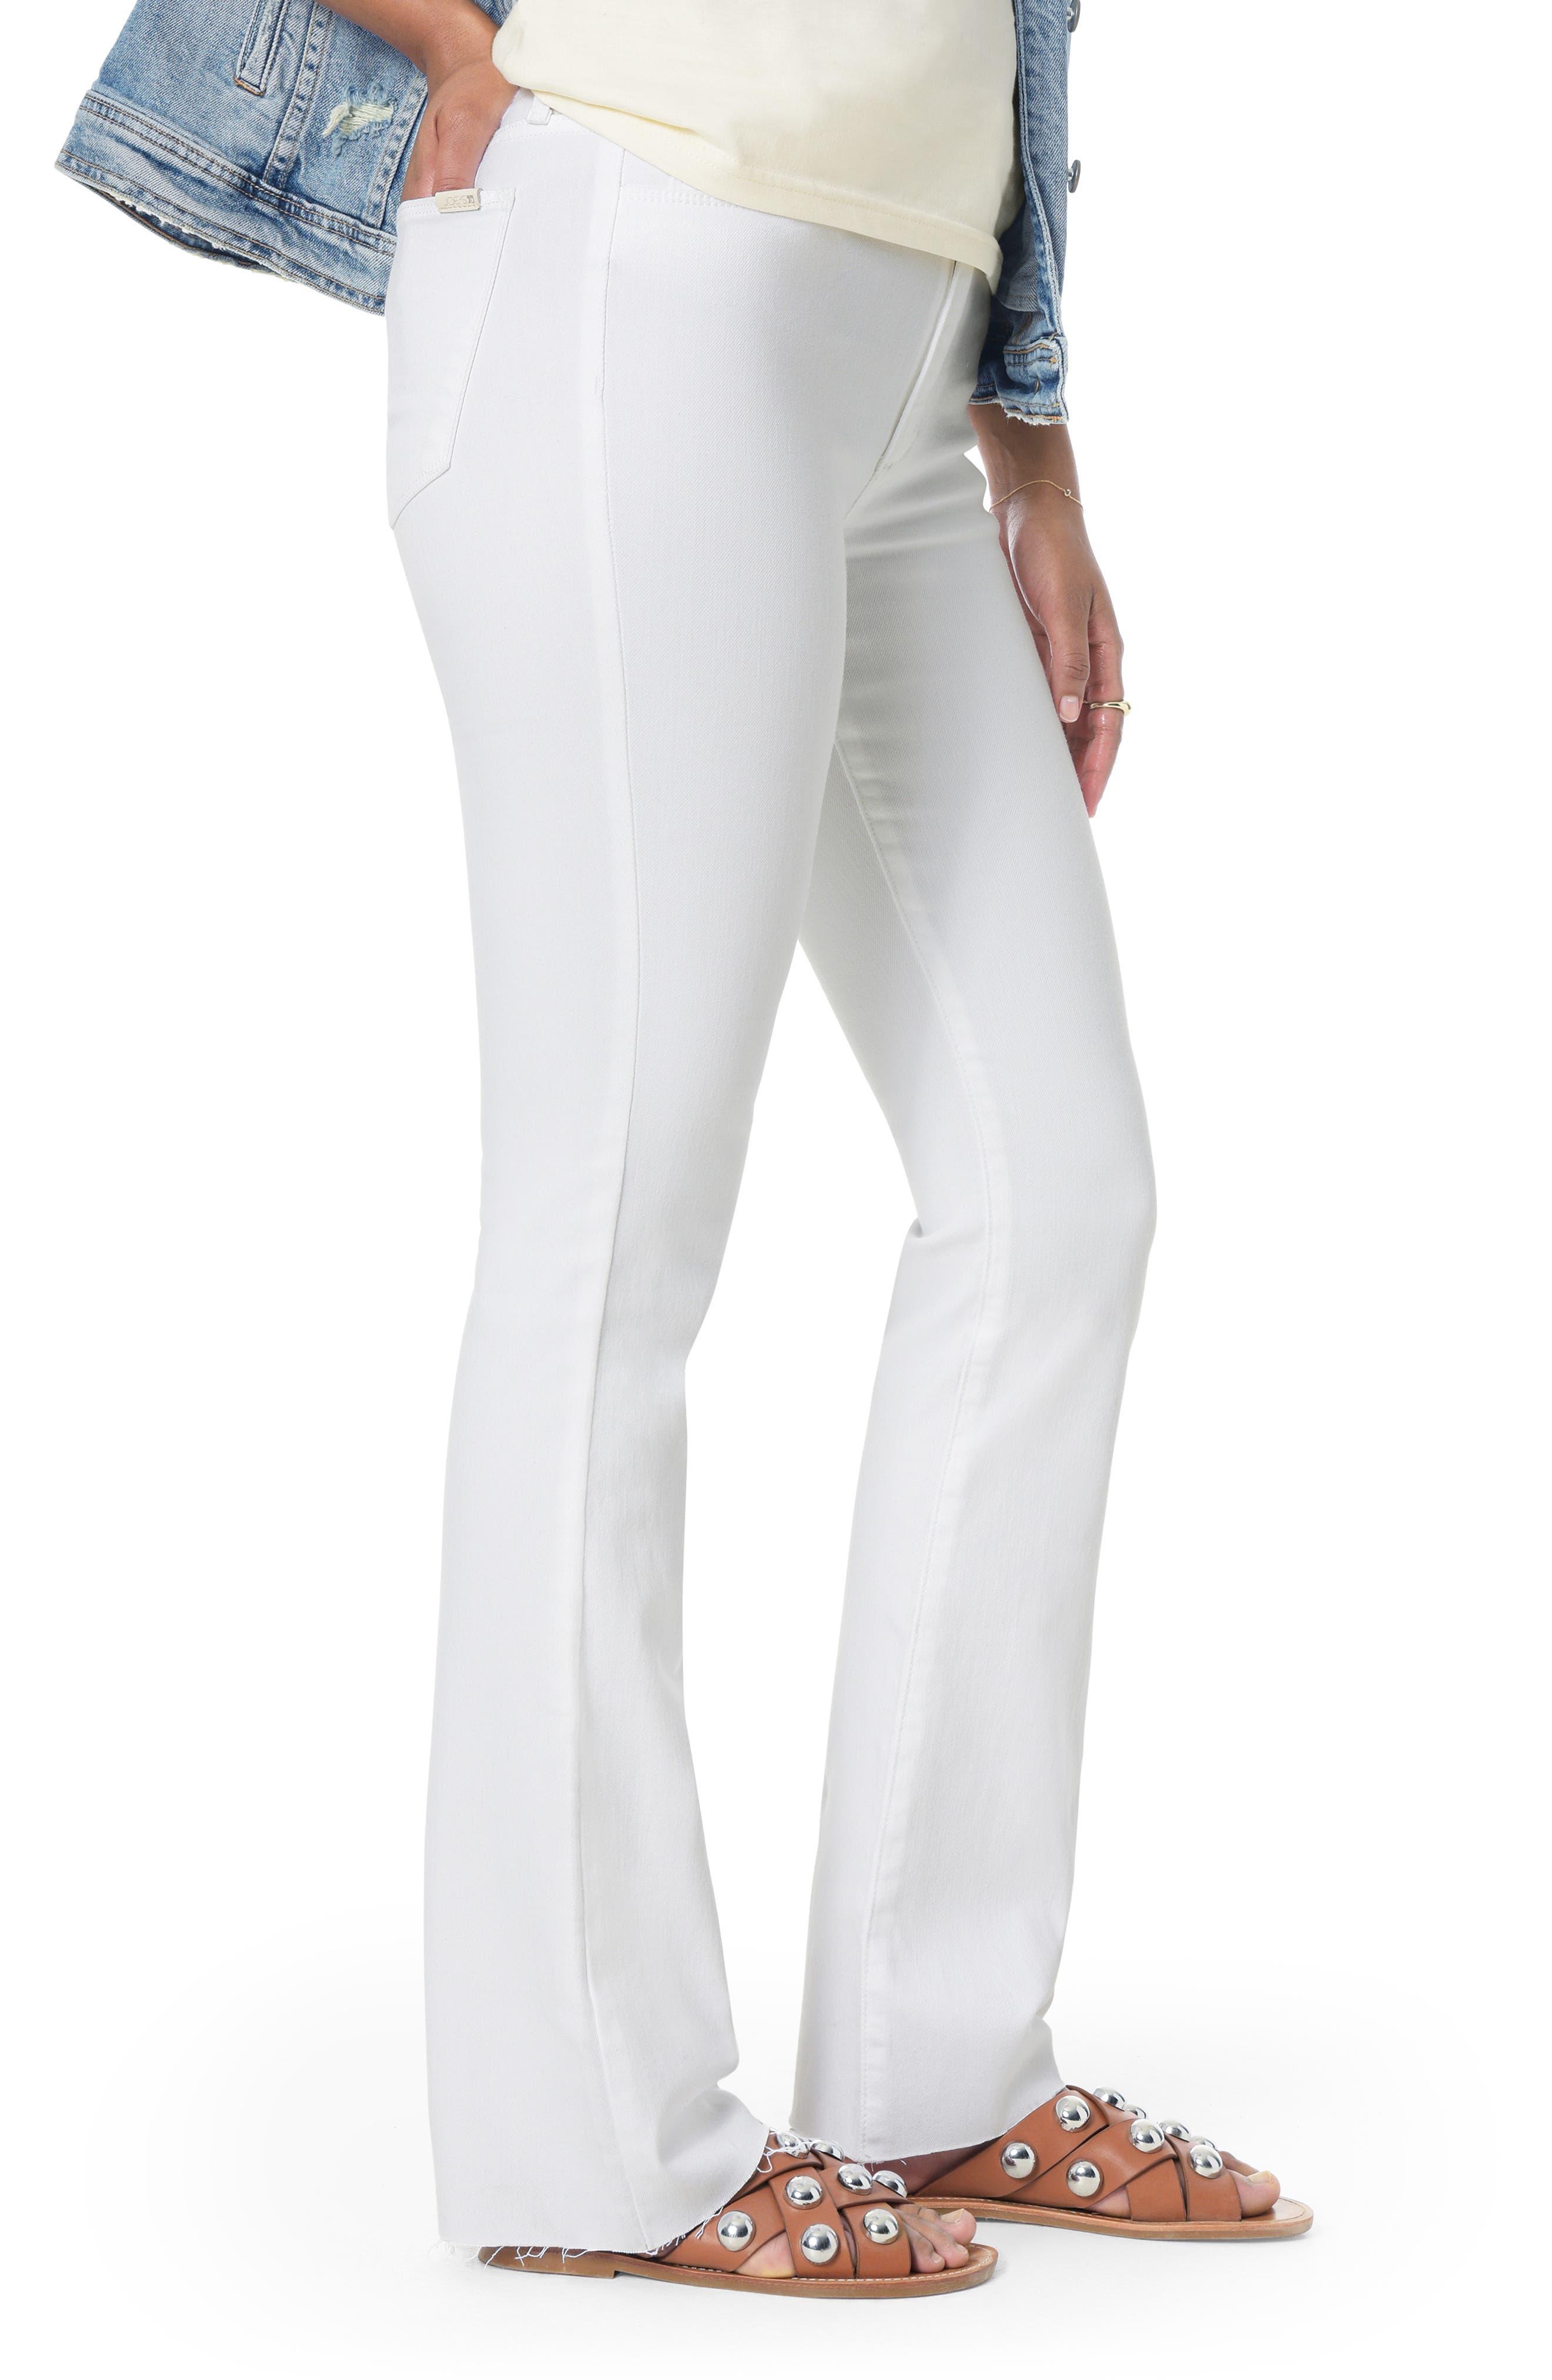 JOE'S, Flawless - Honey High Waist Curvy Bootcut Jeans, Alternate thumbnail 3, color, HENNIE